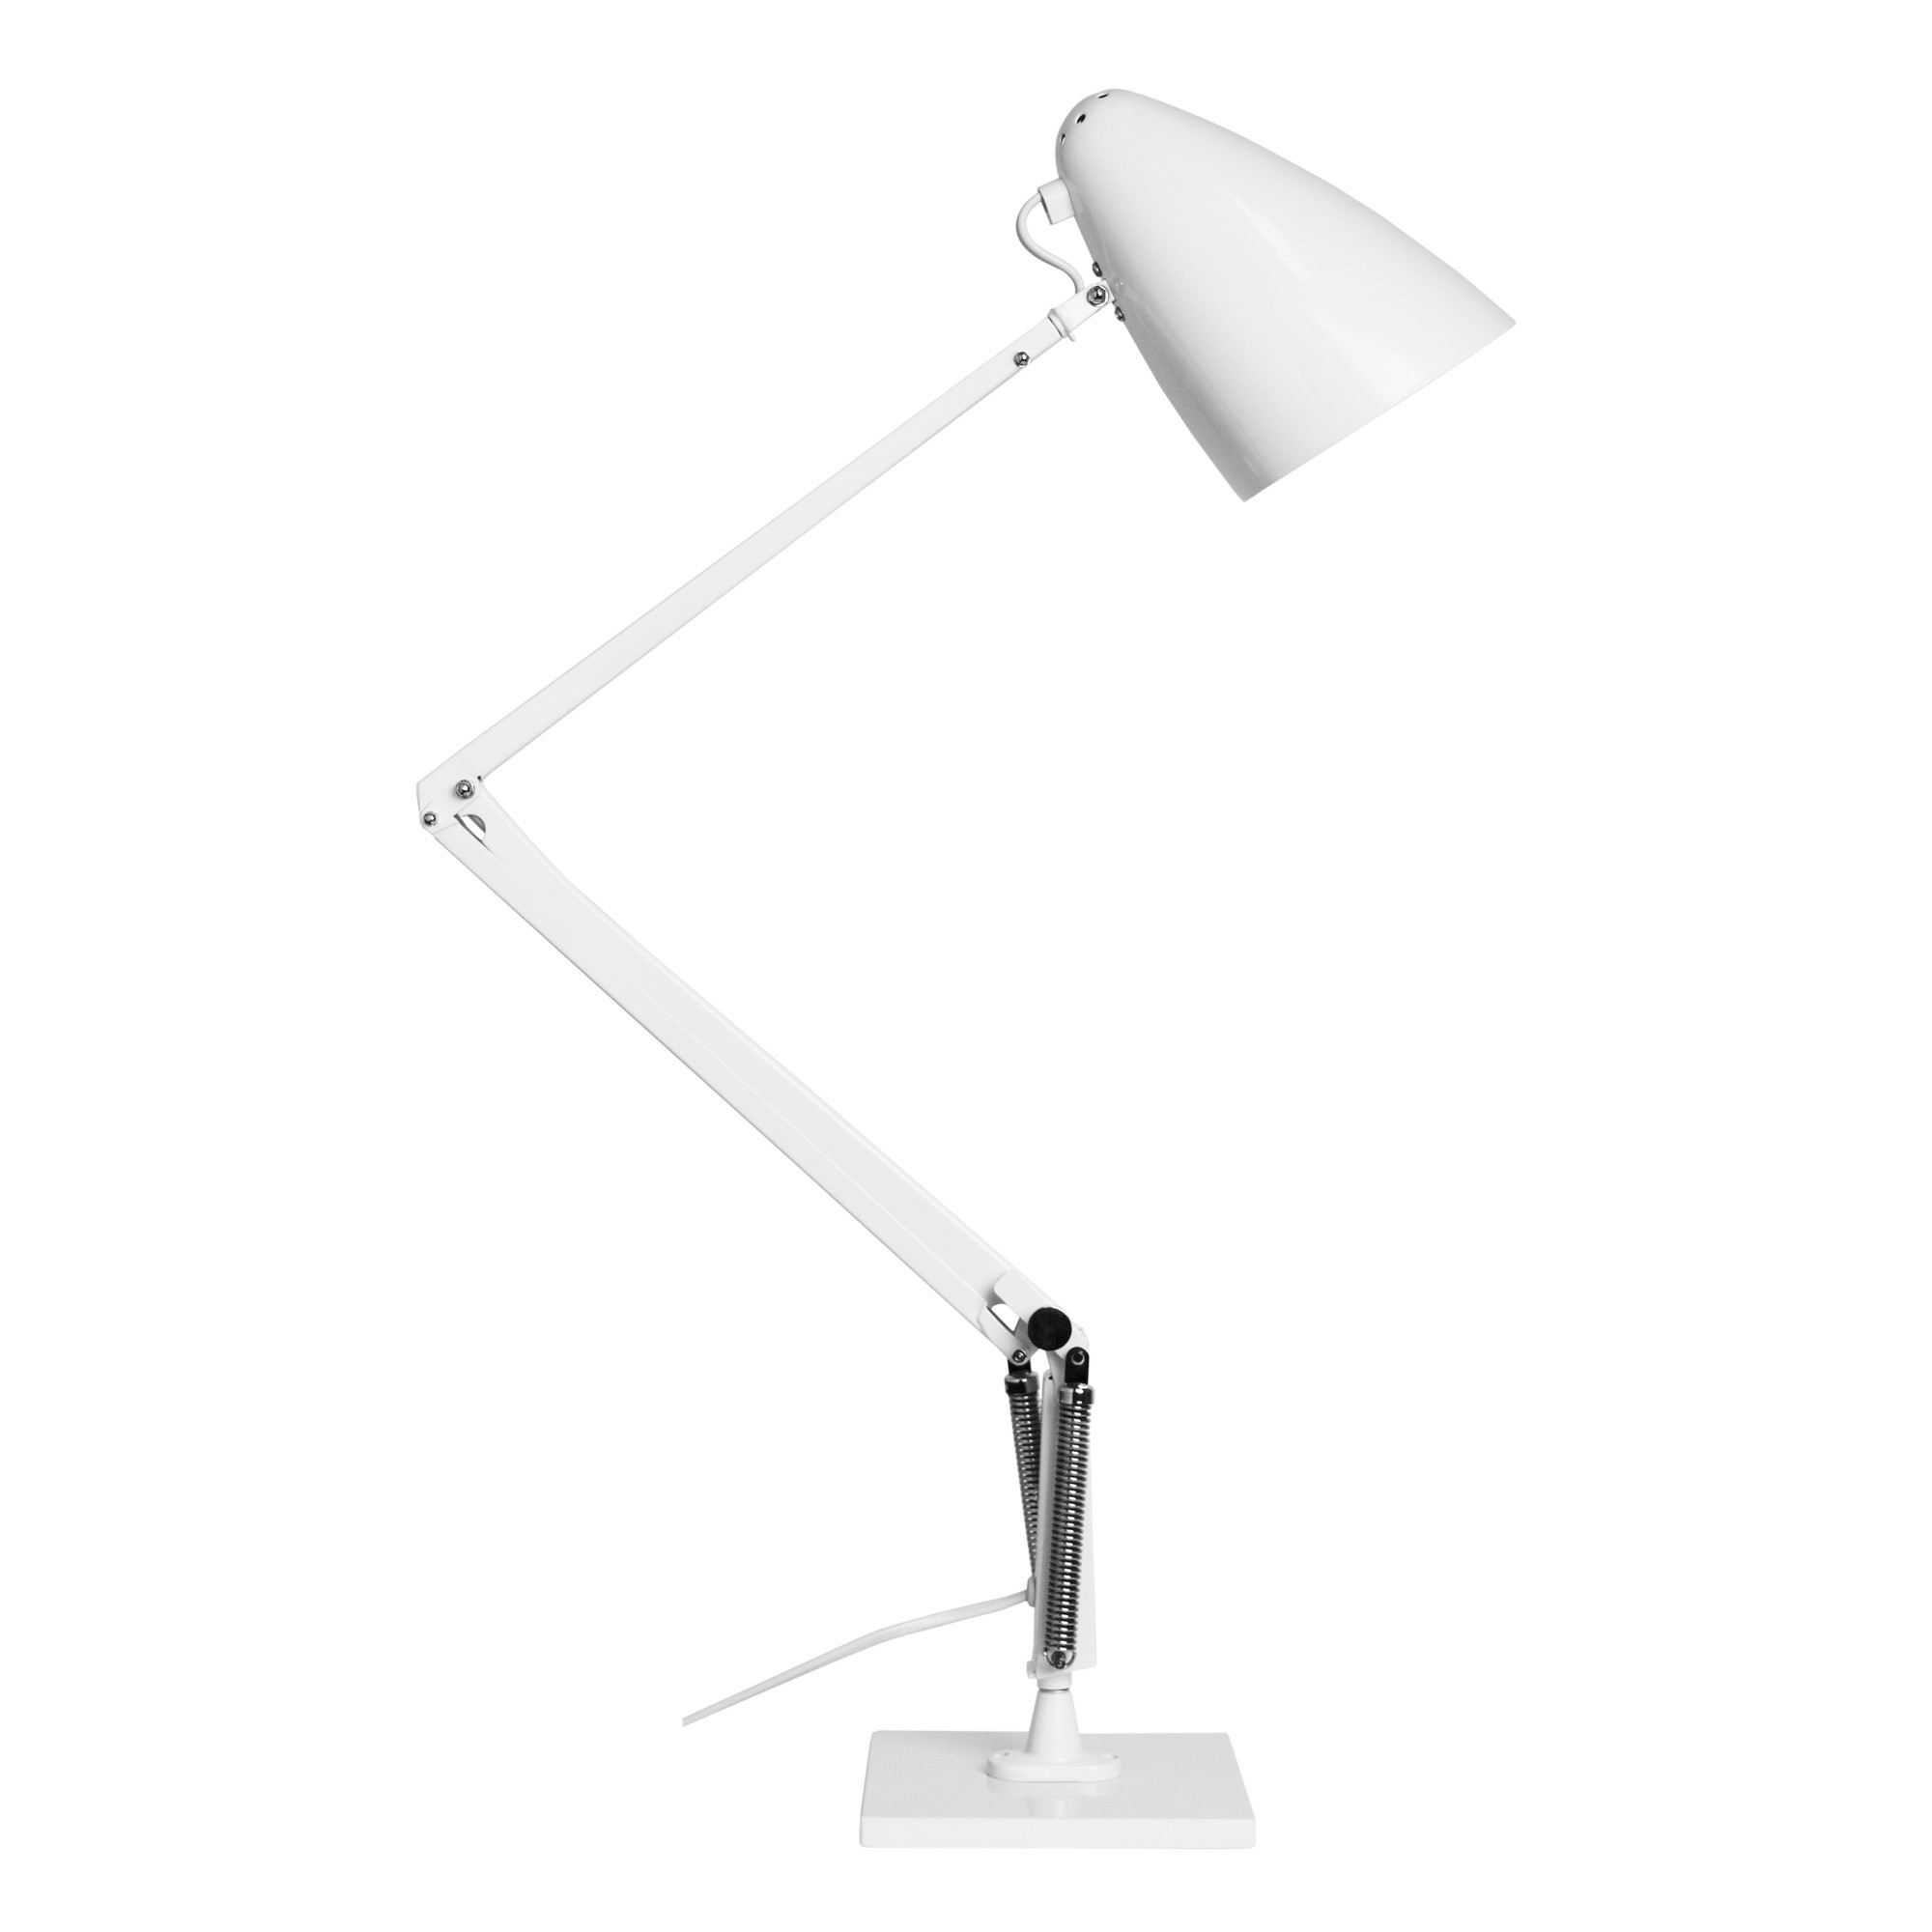 Lift Reproduction Anglepoise Desk Lamp, White